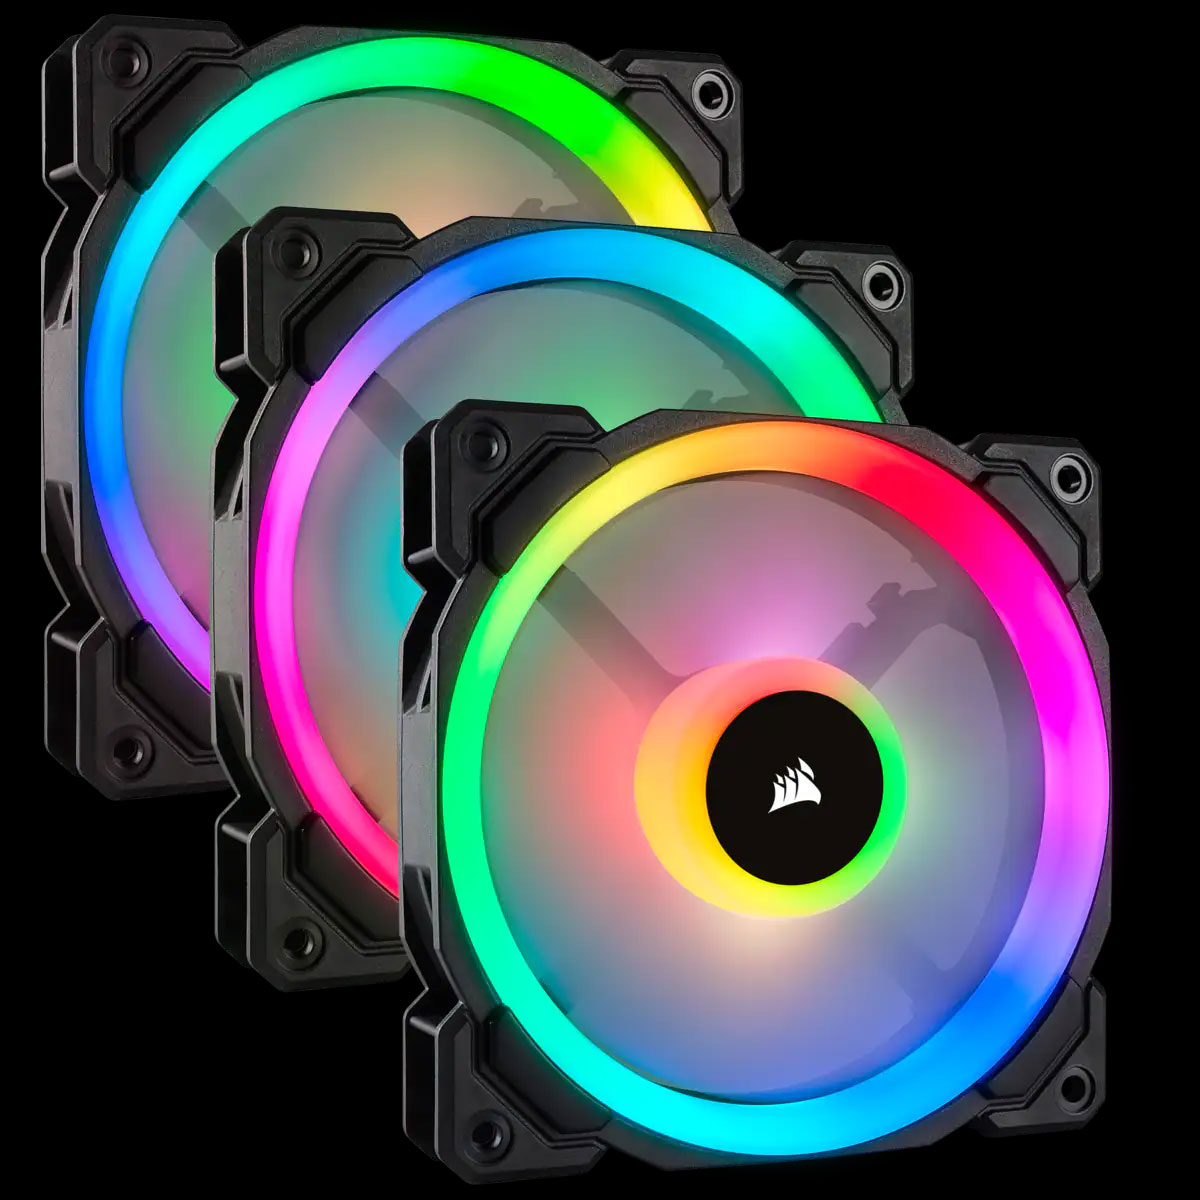 Corsair LL120 RGB Ventilatorji